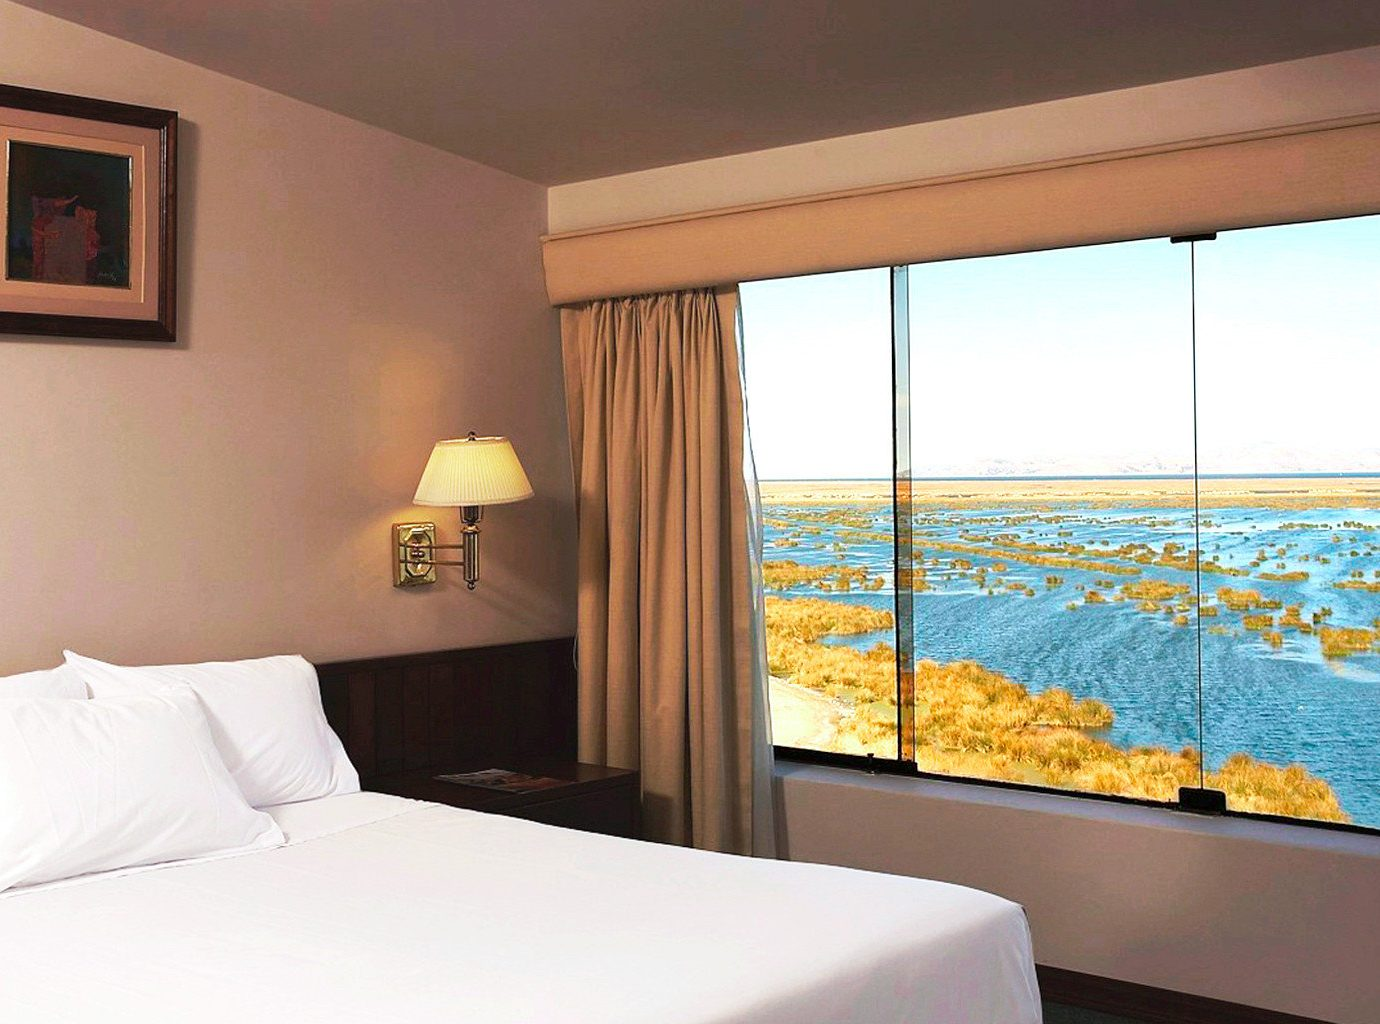 Bedroom Classic Scenic views Suite Waterfront property white condominium Villa cottage